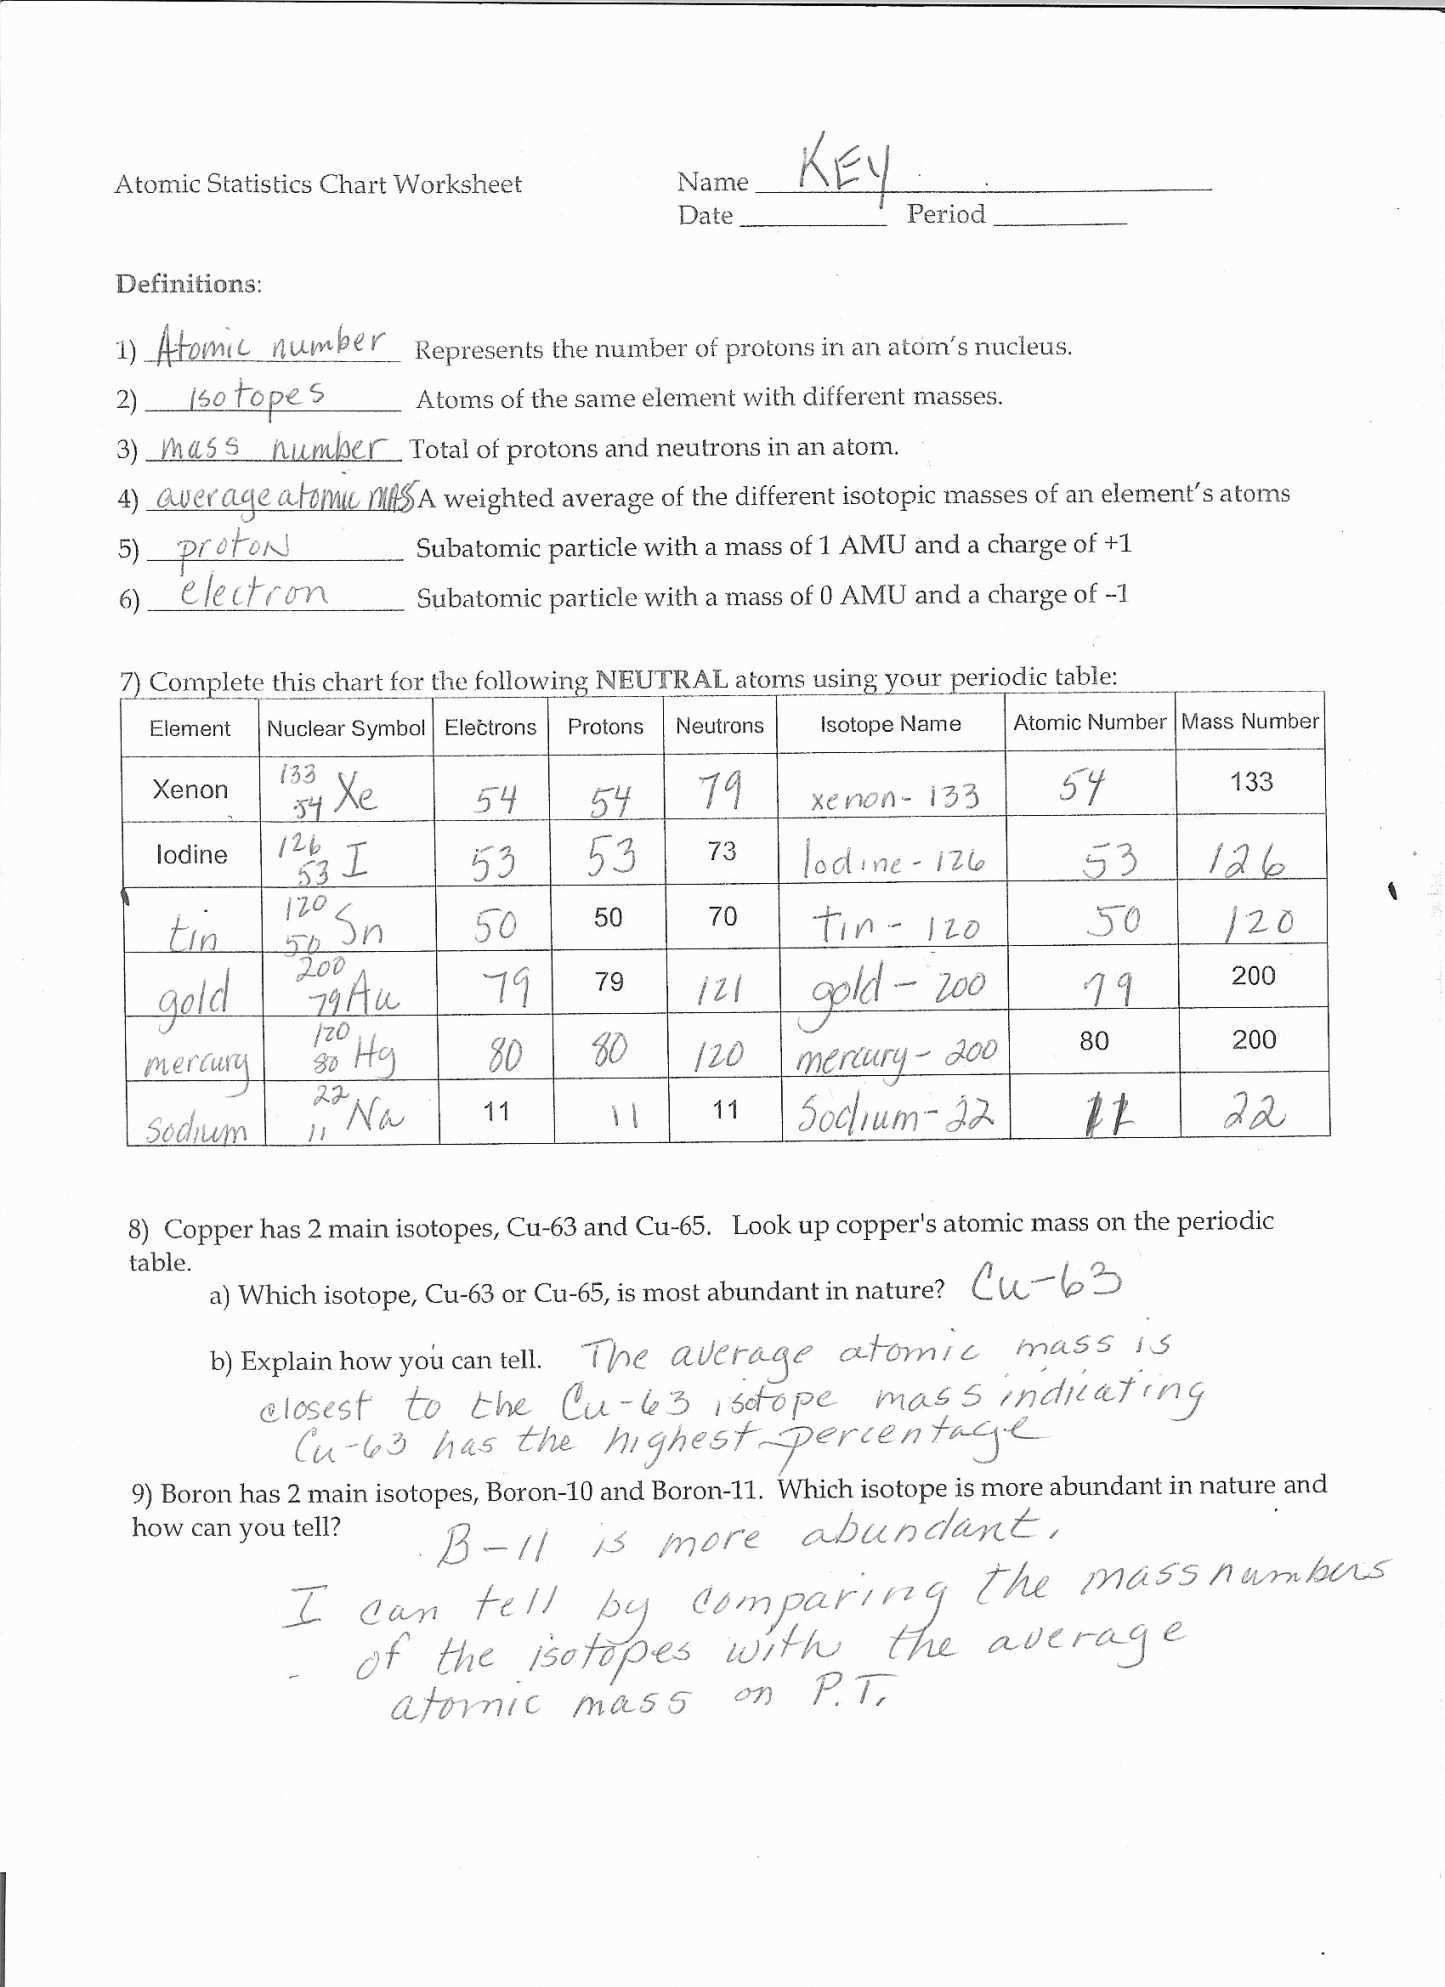 Atomic Structure Practice Worksheet